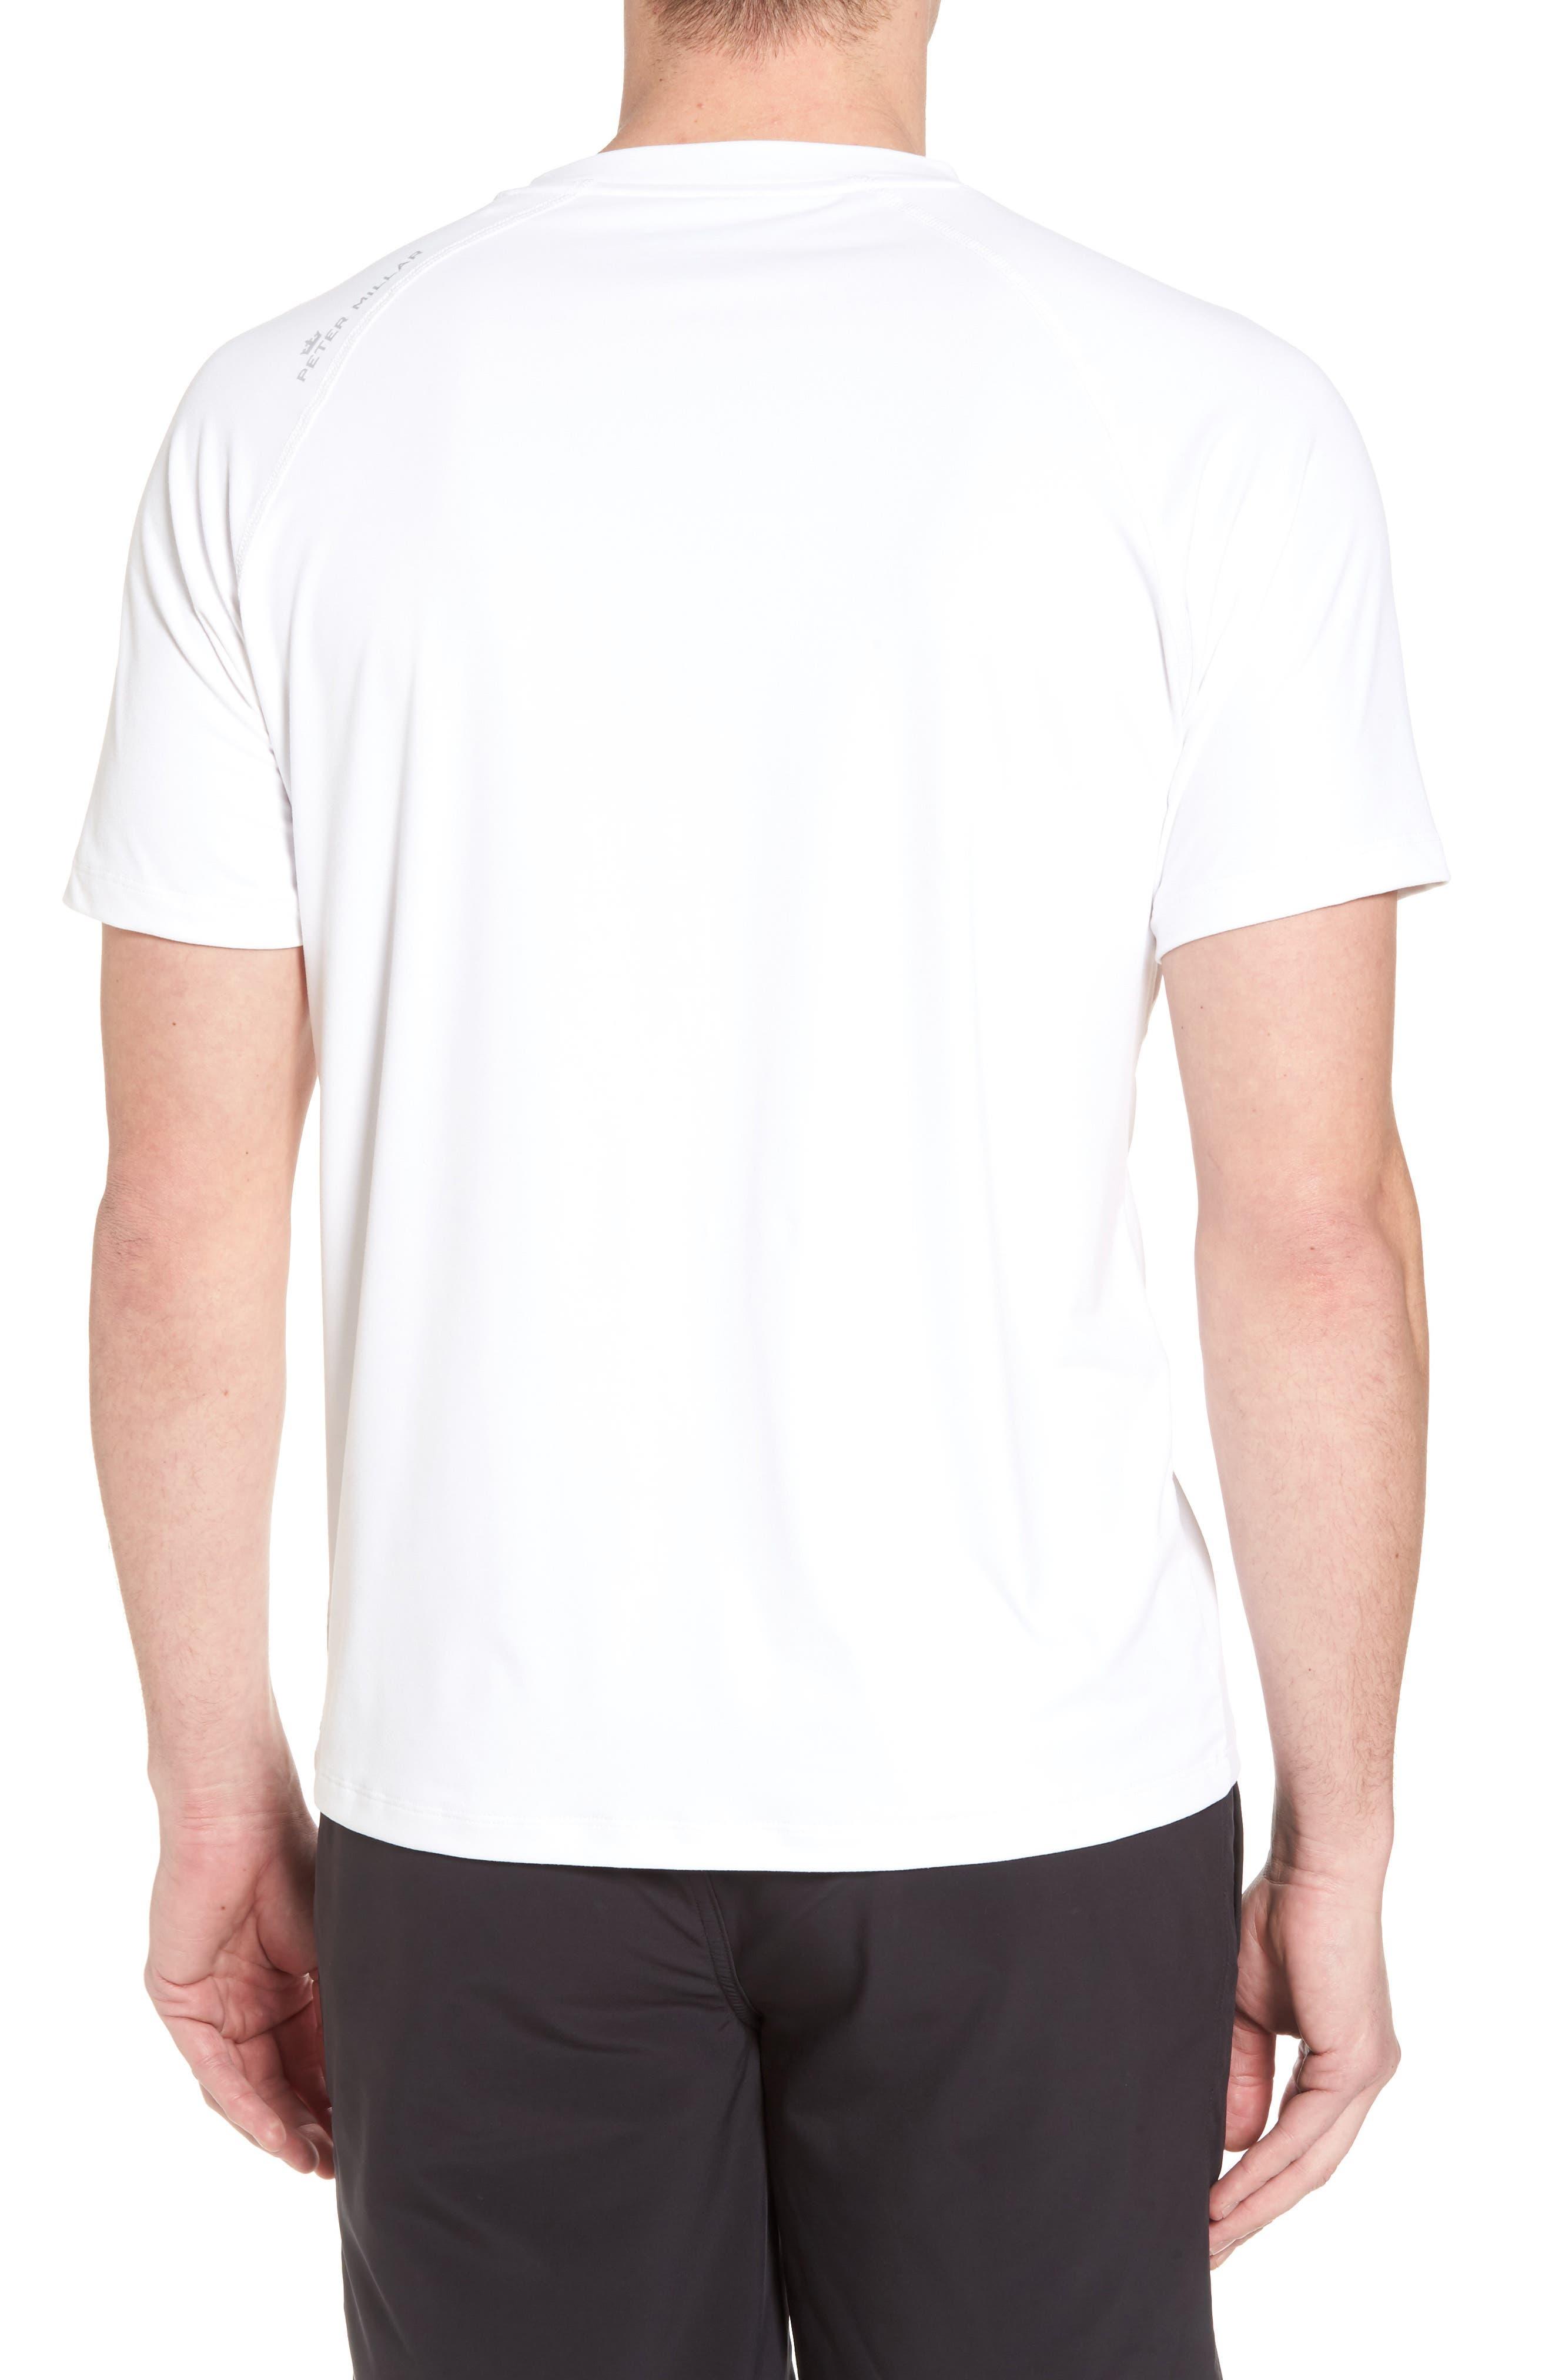 Rio Regular Fit Technical T-Shirt,                             Alternate thumbnail 2, color,                             100